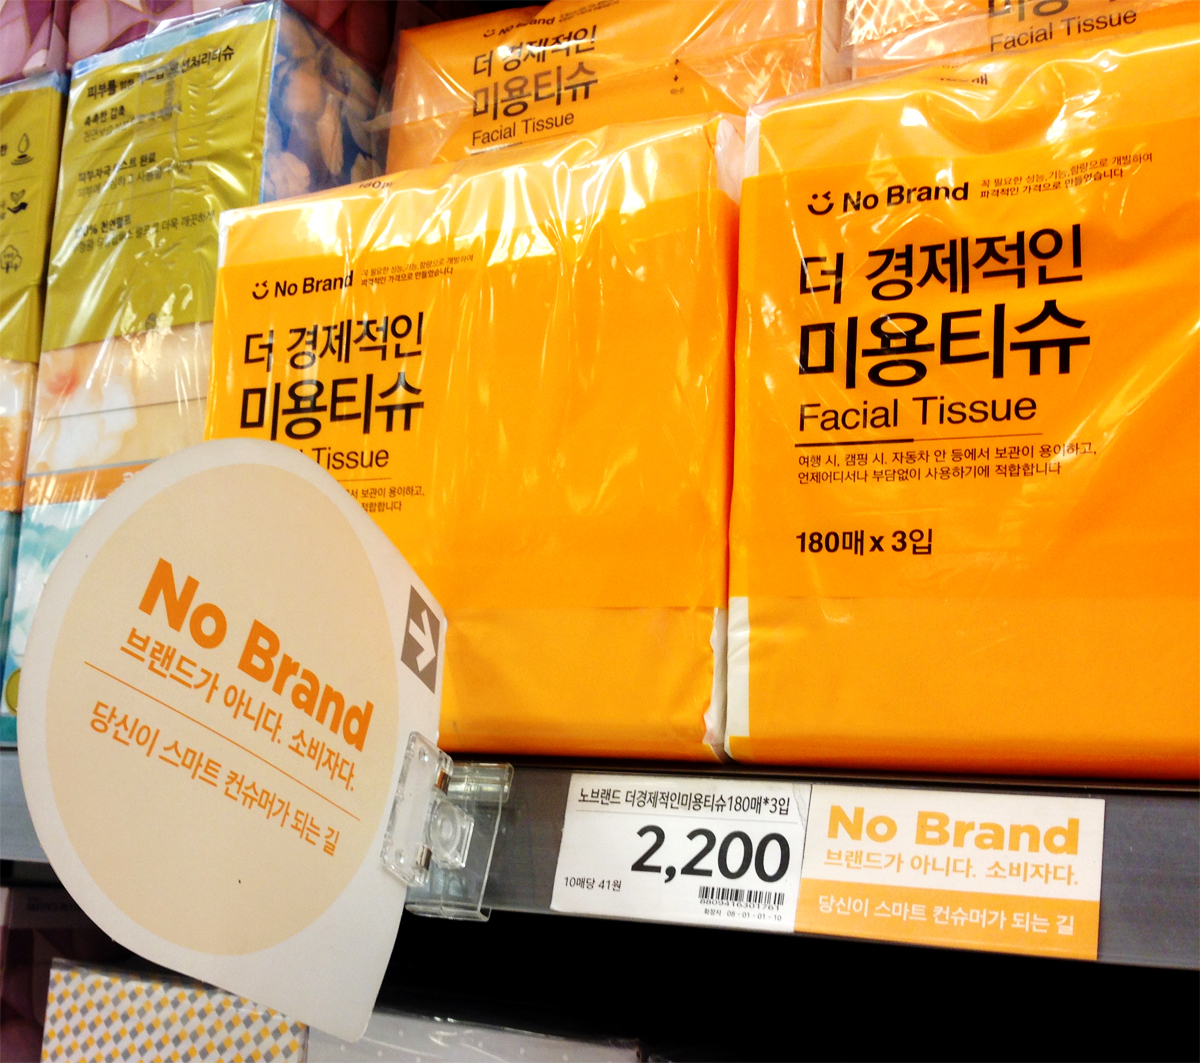 No Brand tissue